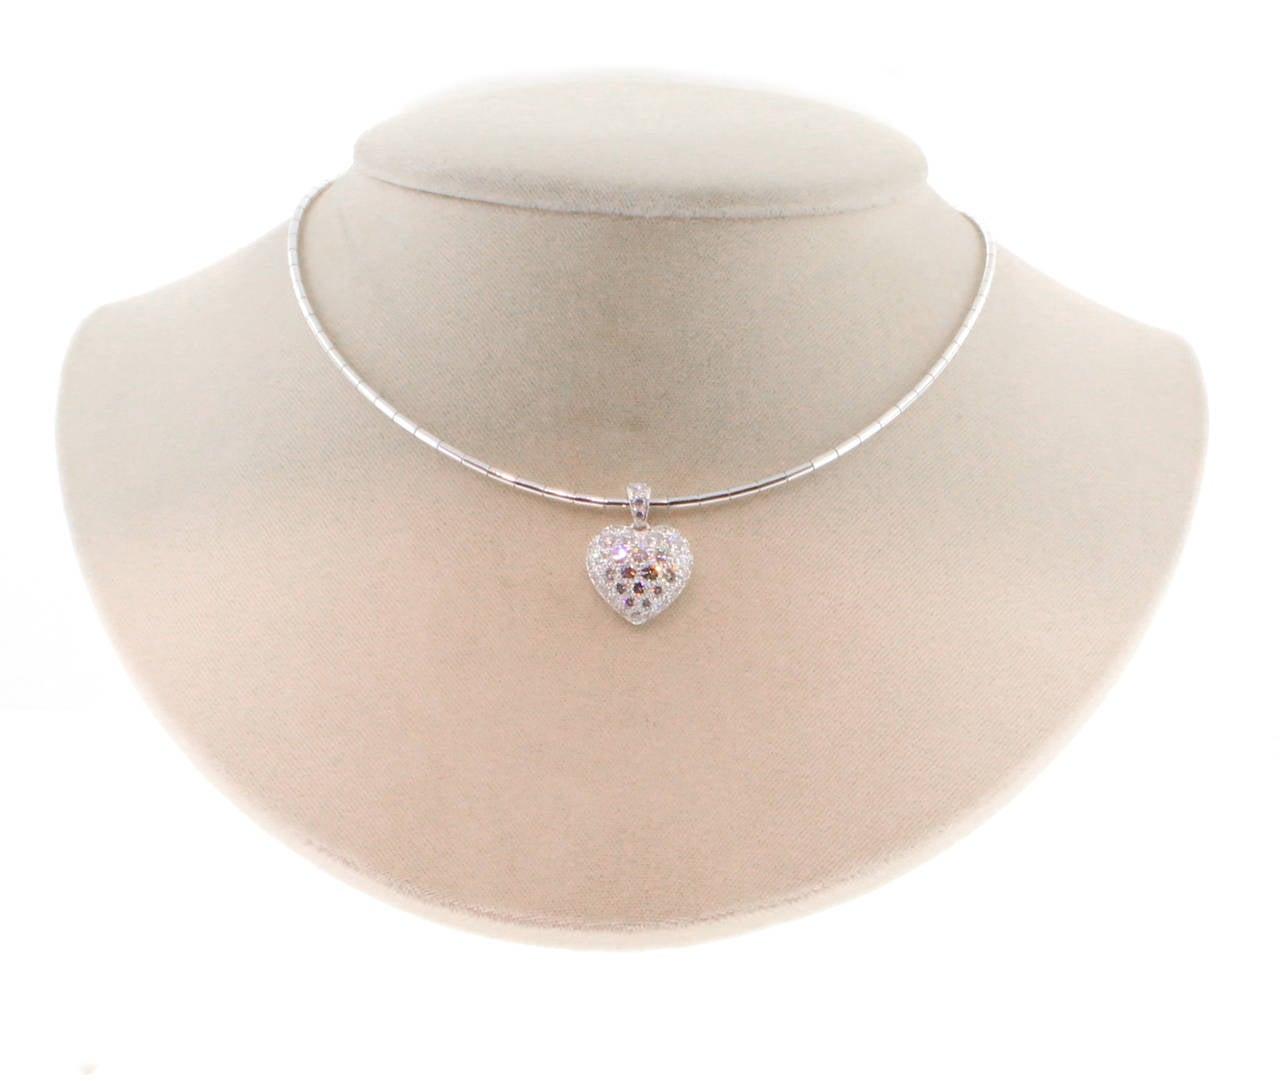 Cartier Puffed Diamond Gold Heart Choker Necklace For Sale 1